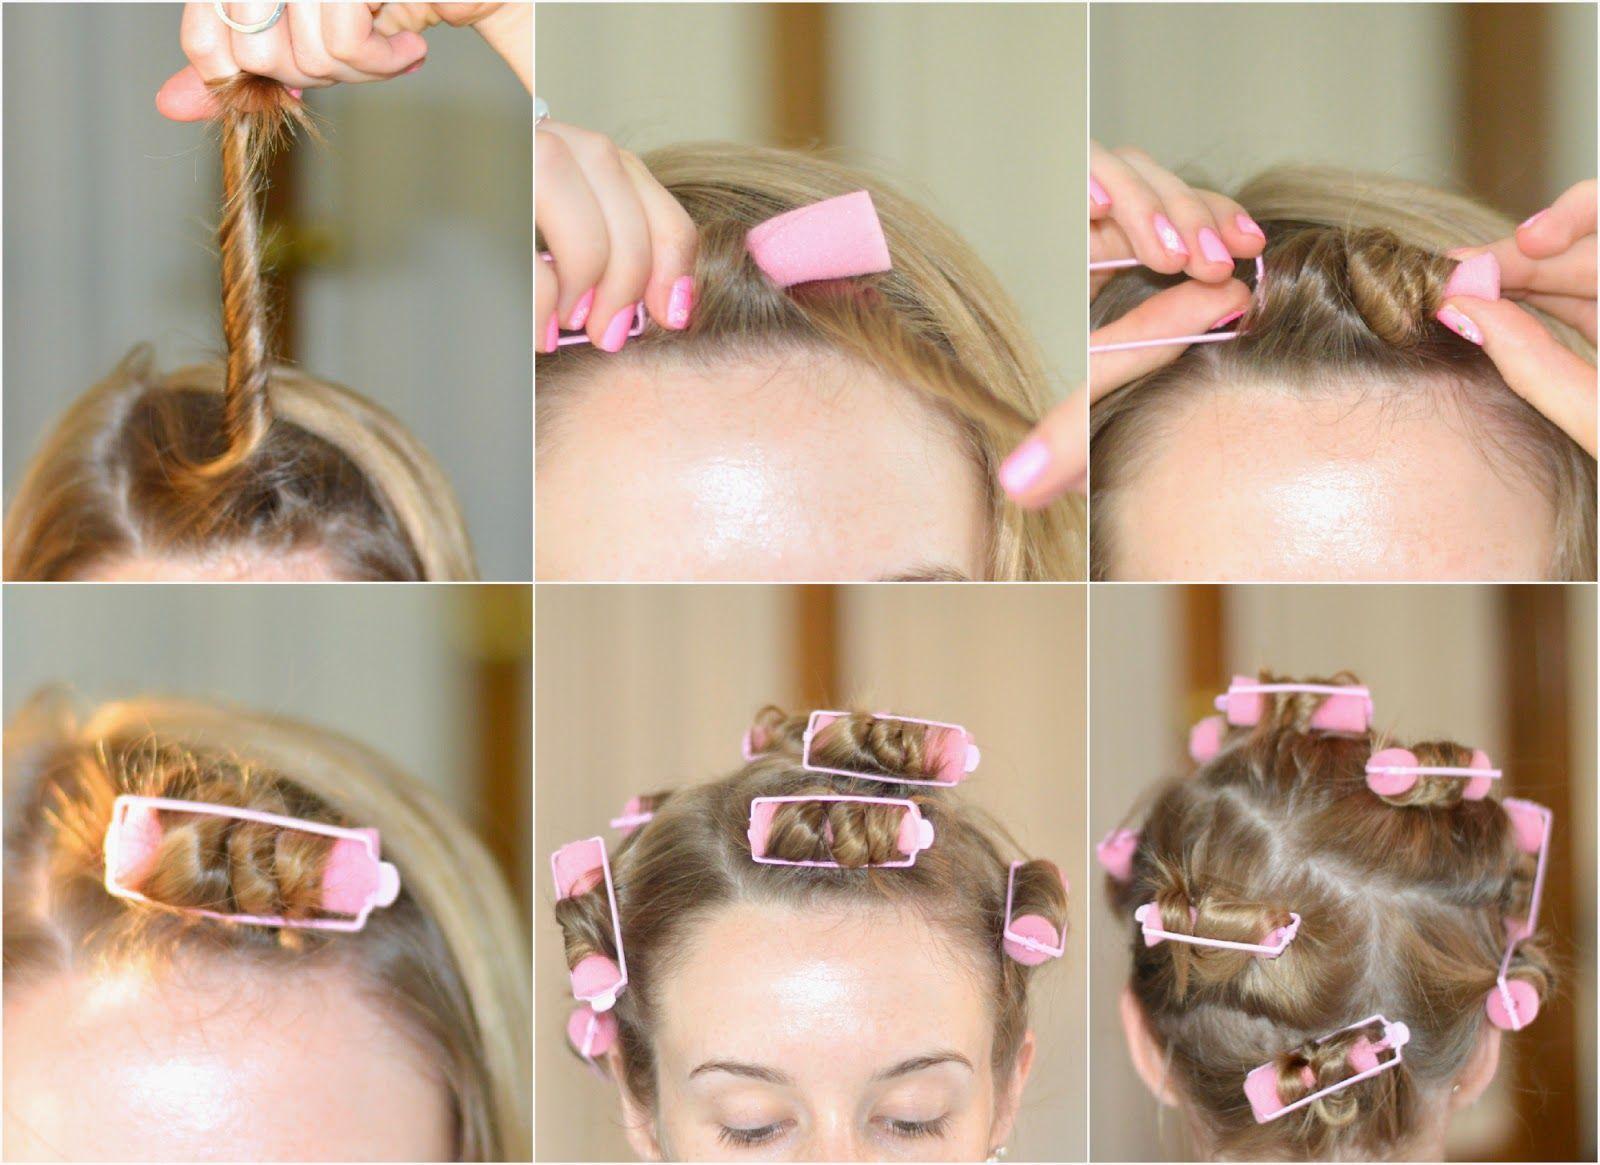 Howto Curl Short Hair Using Cheap Foam Rollers How To Curl Short Hair Foam Rollers Hair Short Hair Tutorial